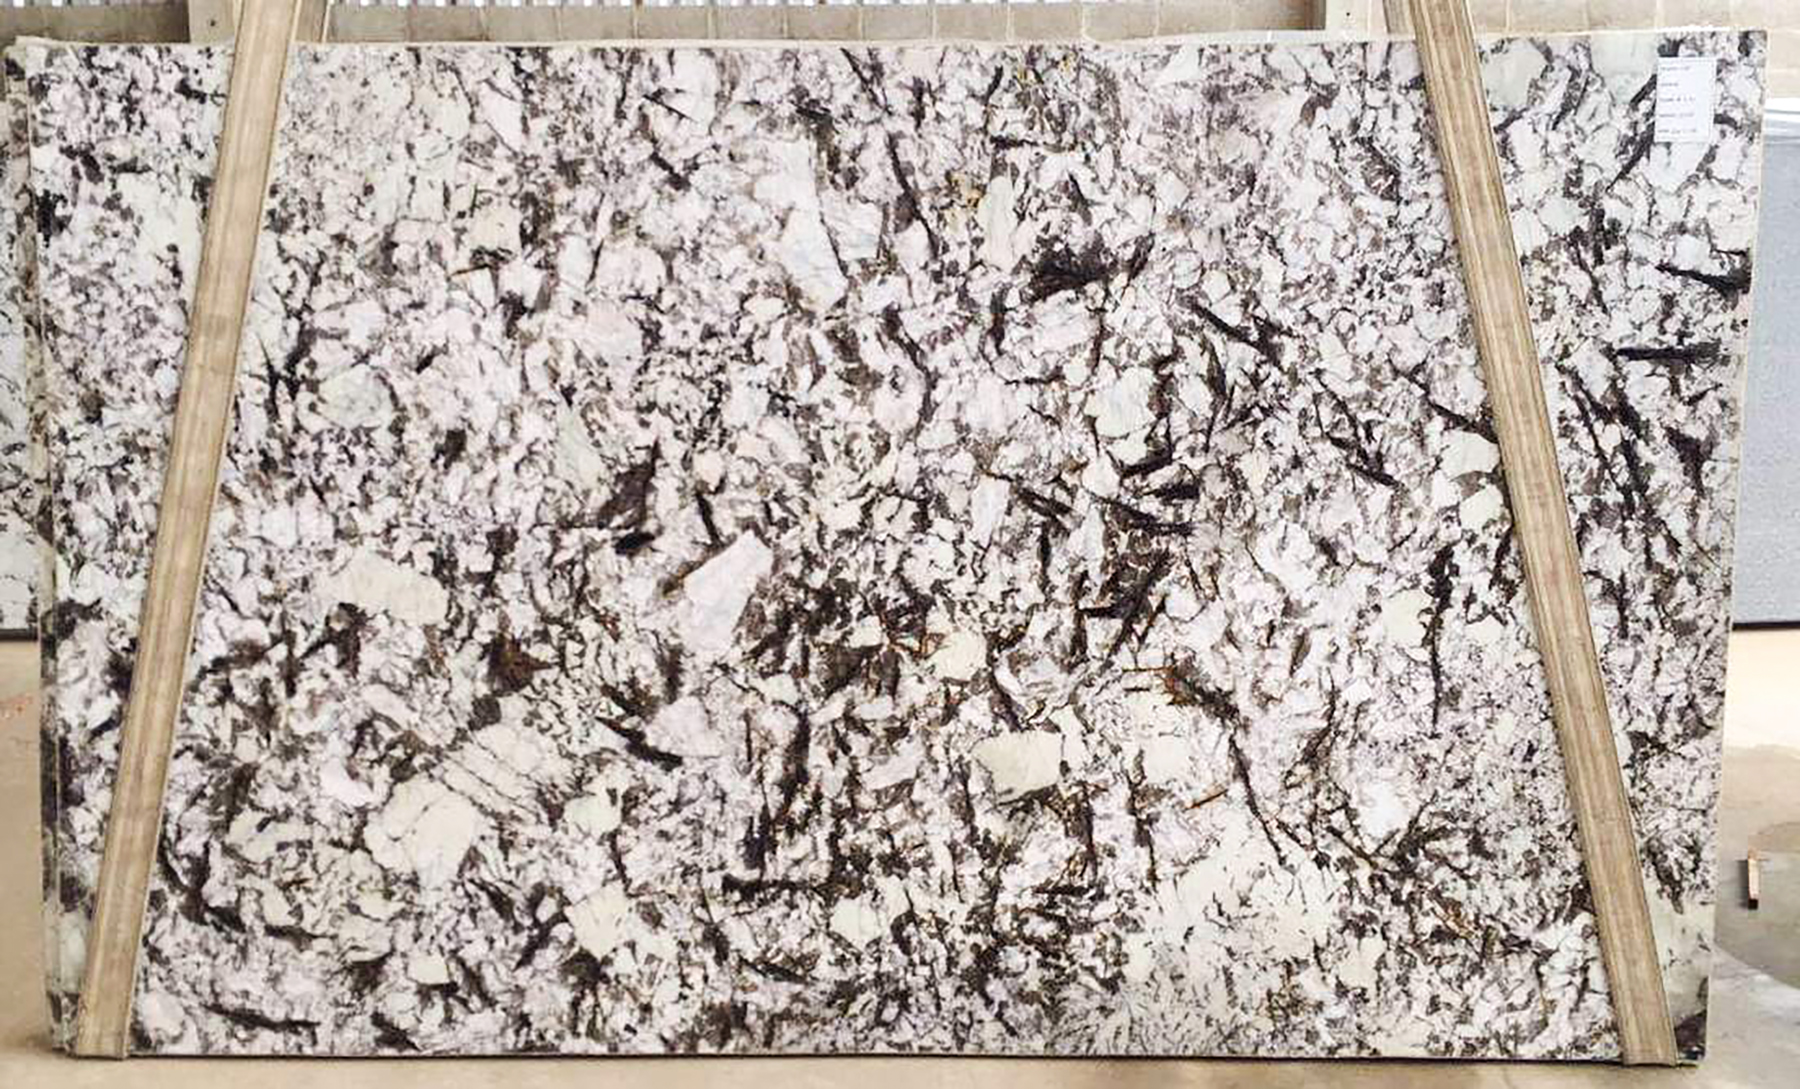 Buy Splendor White Granite Direct at Di Pietra Design in